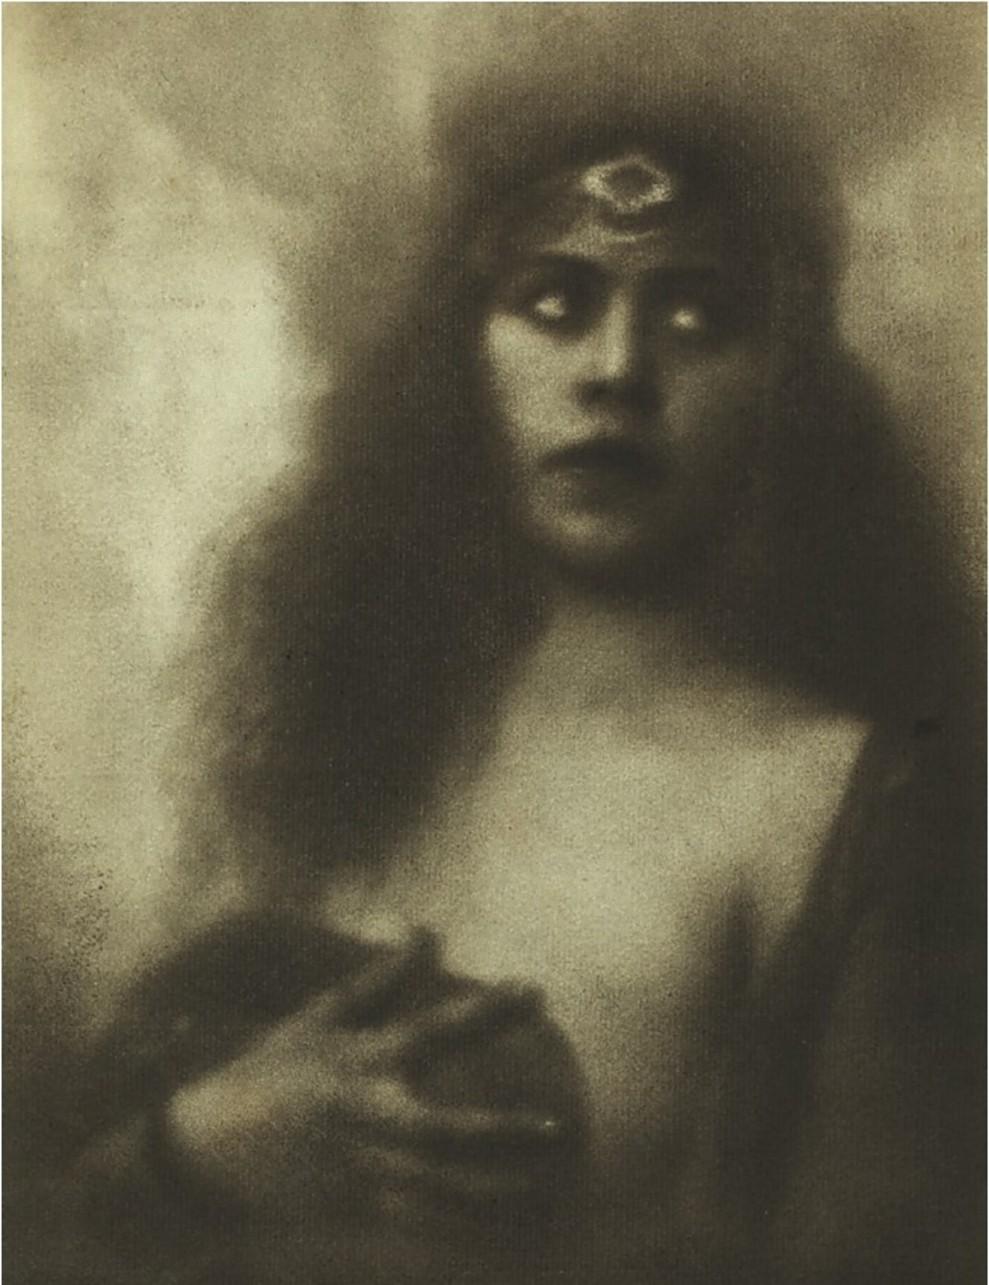 Alexander Danilovich Grinberg - Portrait of an unknown actress, 1923